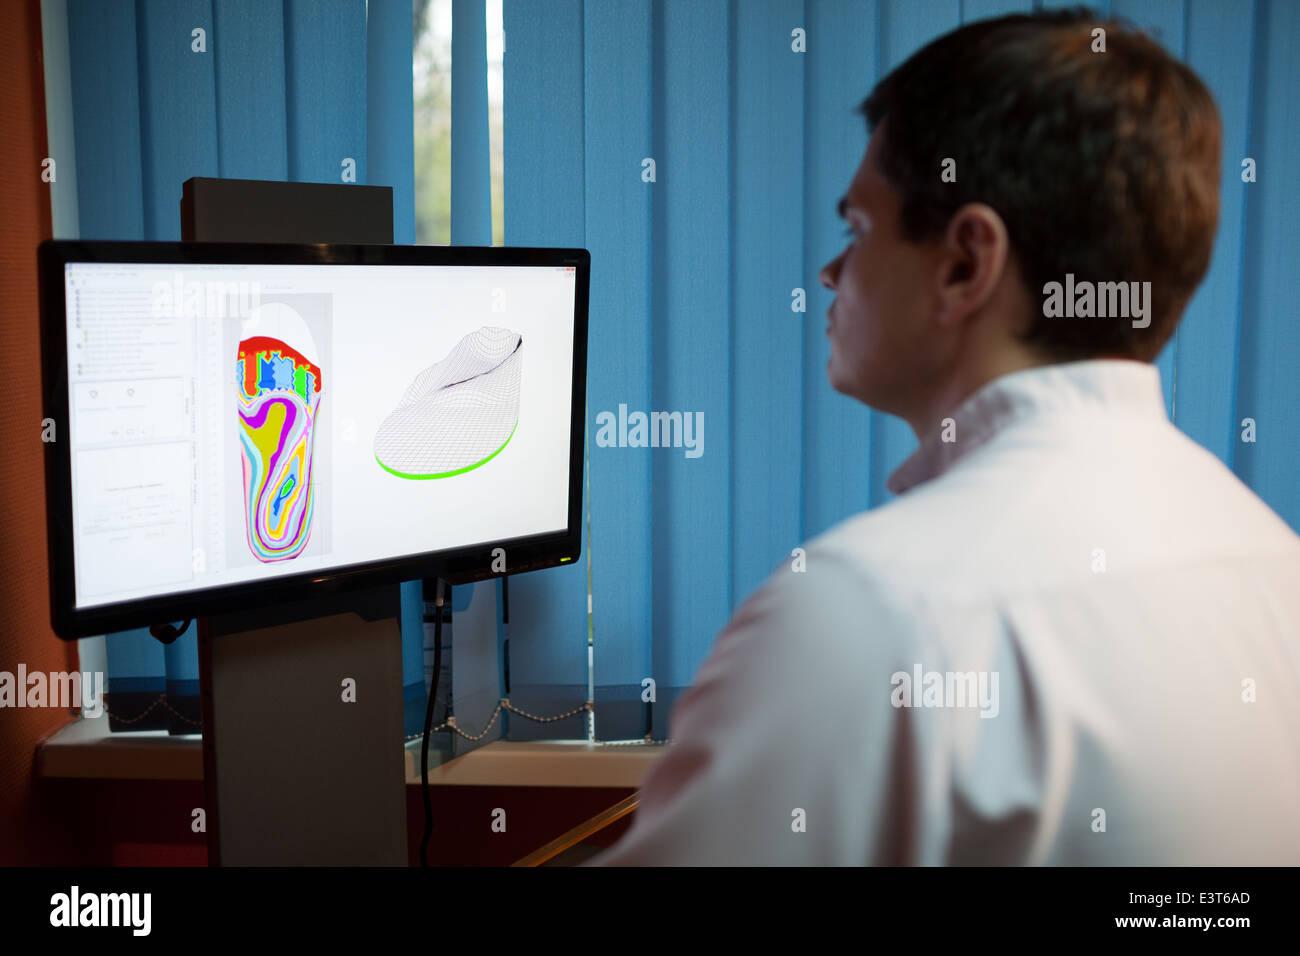 Orthopaedist at work with digital footstep model - Stock Image